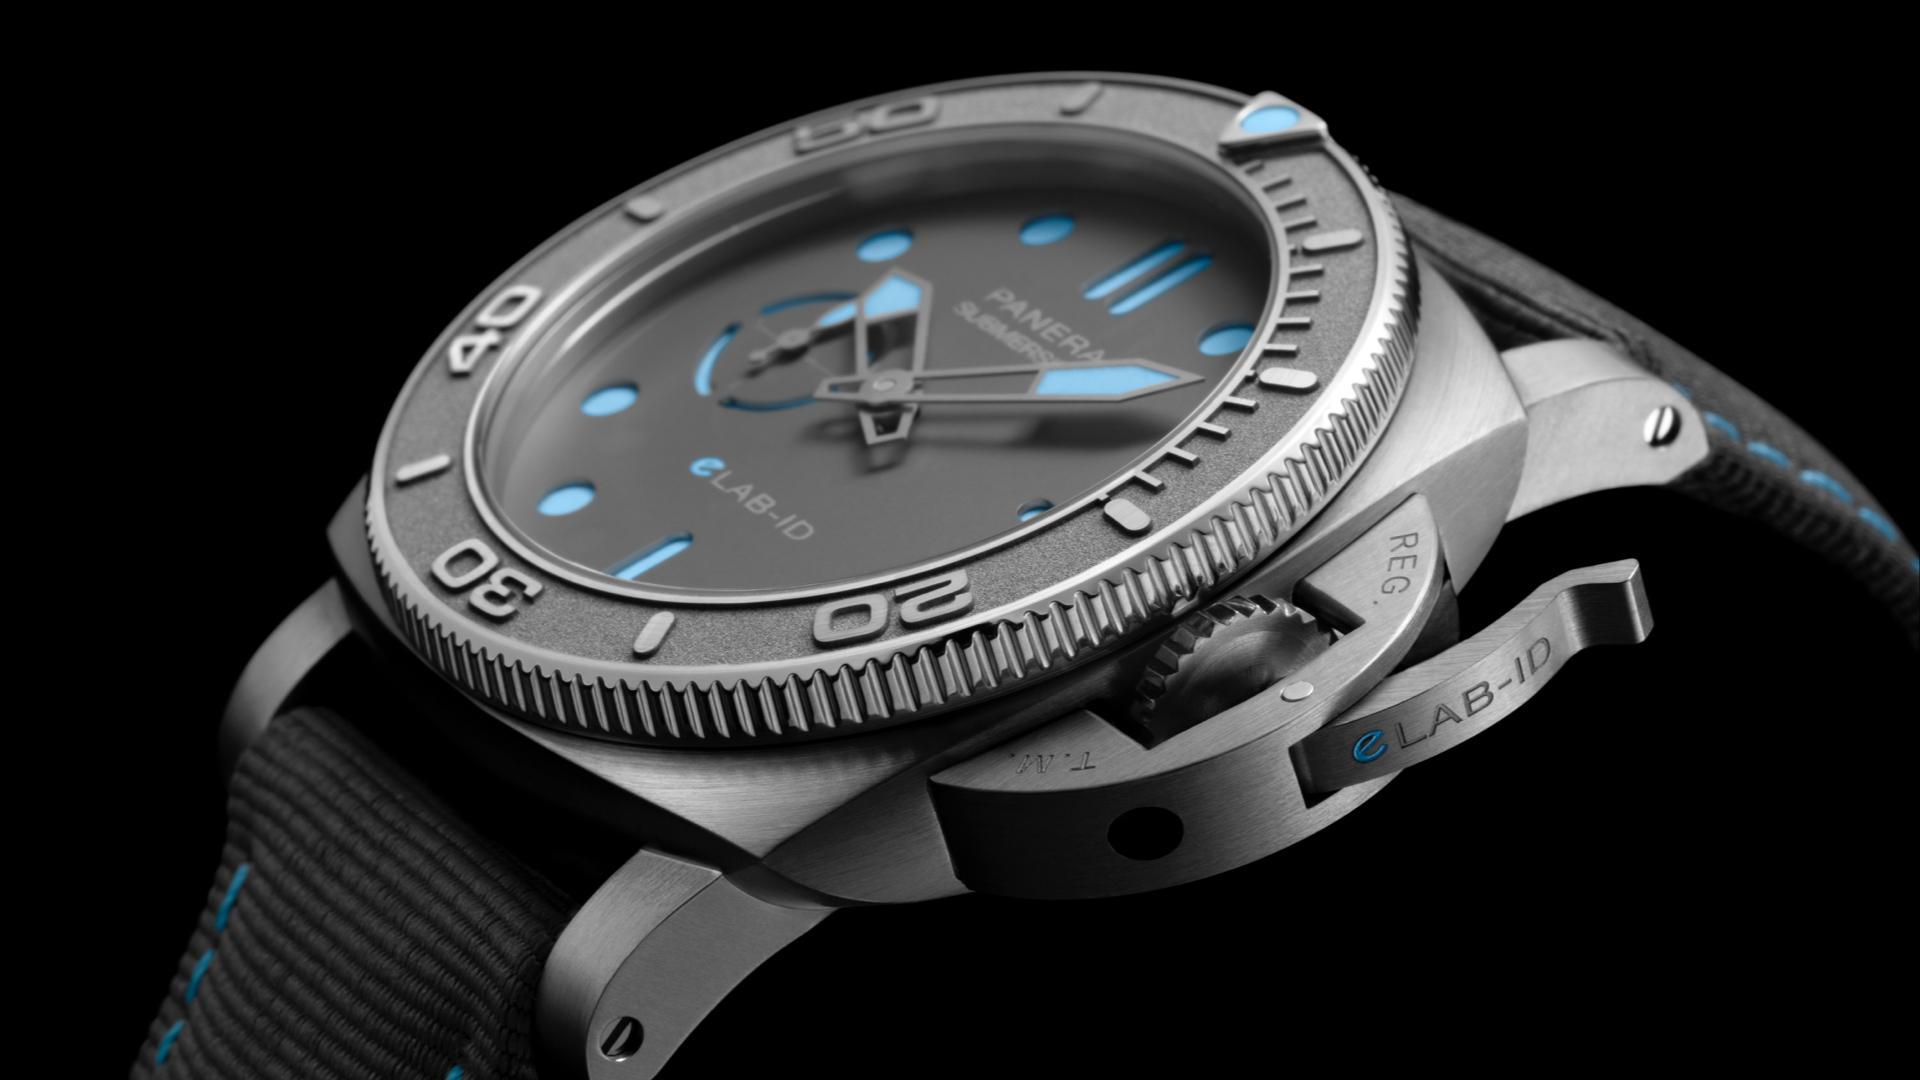 Orologi da esploratori: Panerai Submersible eLab-ID